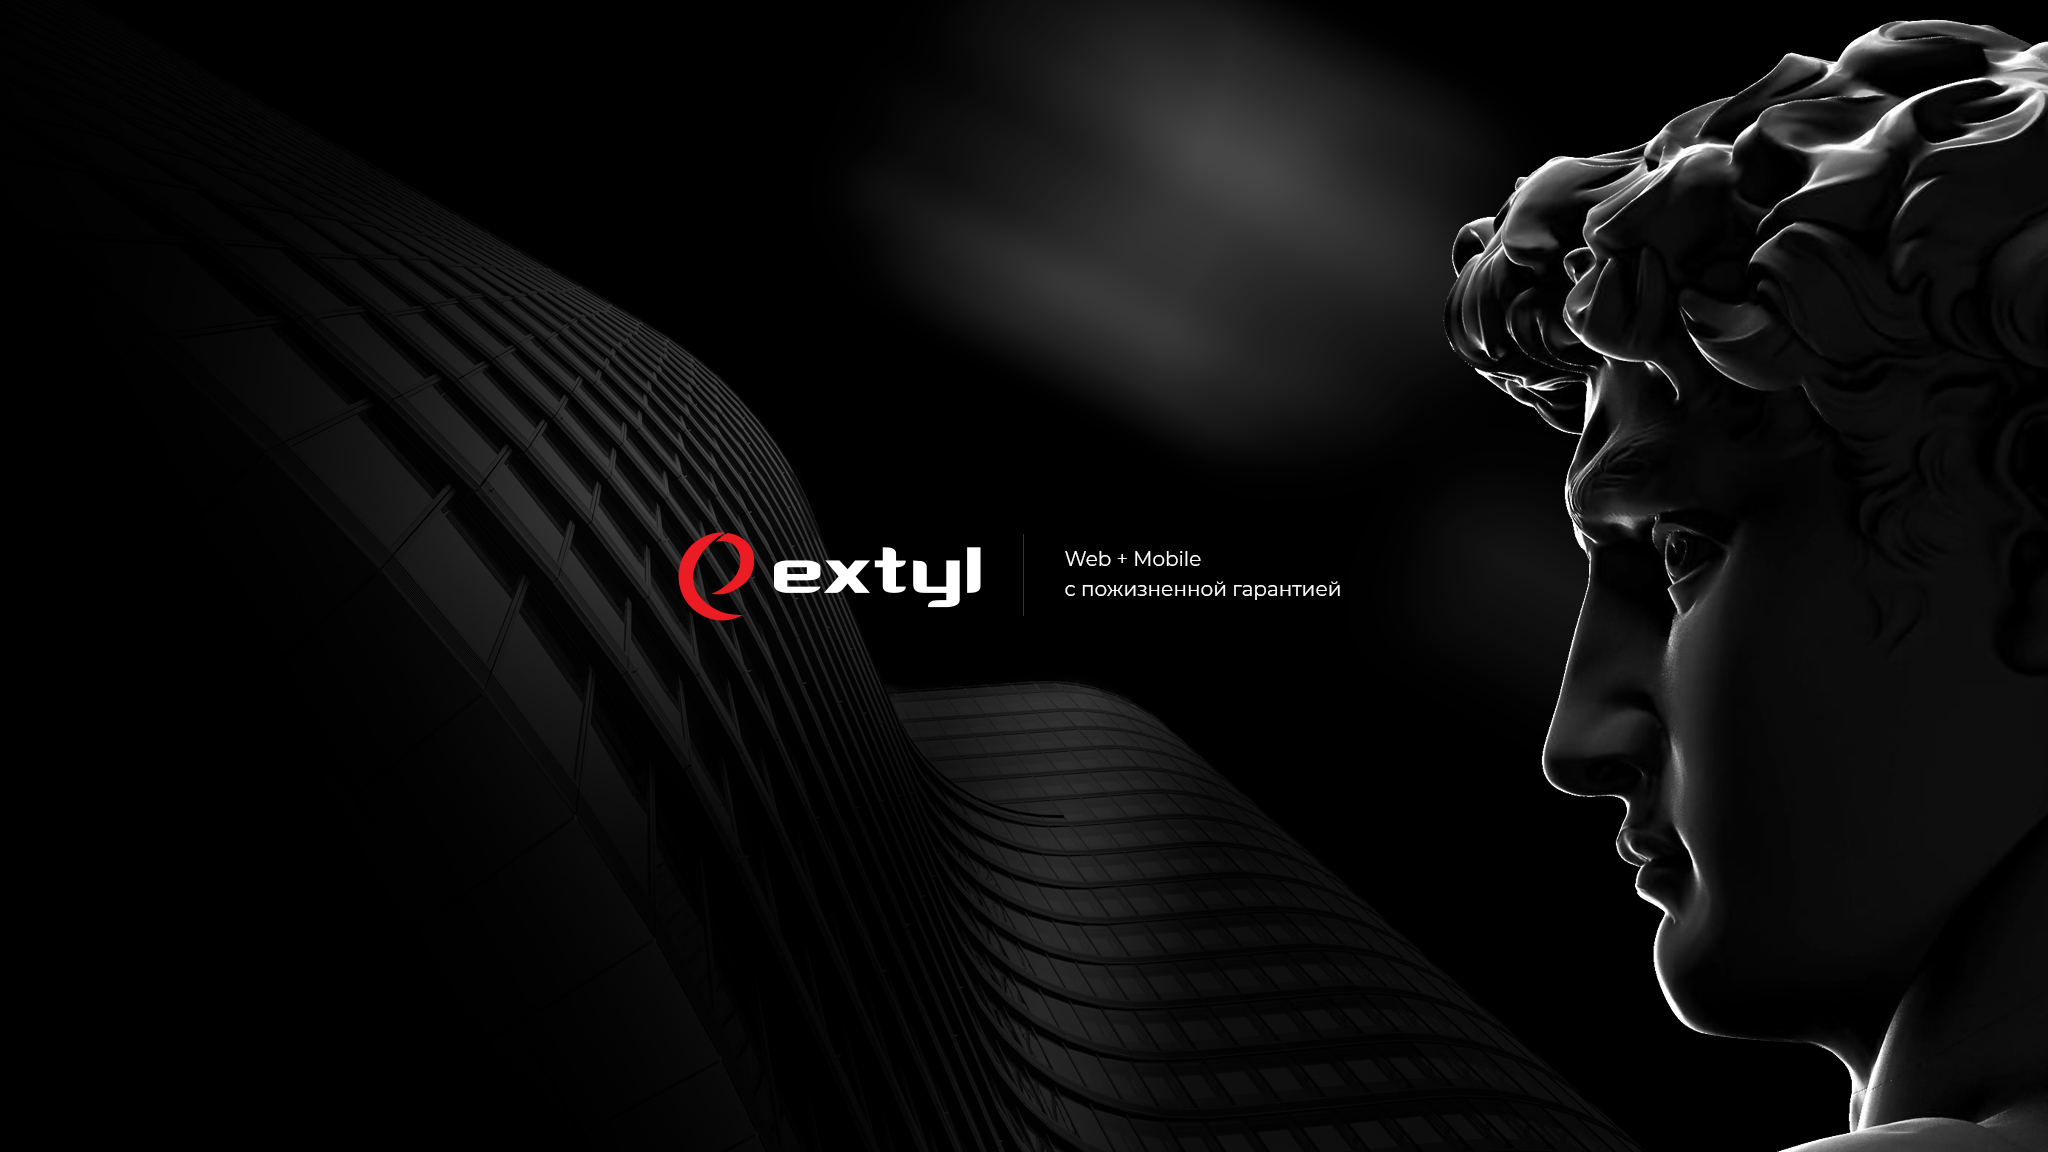 Extyl Web Design (UI/UX) Russian Federation